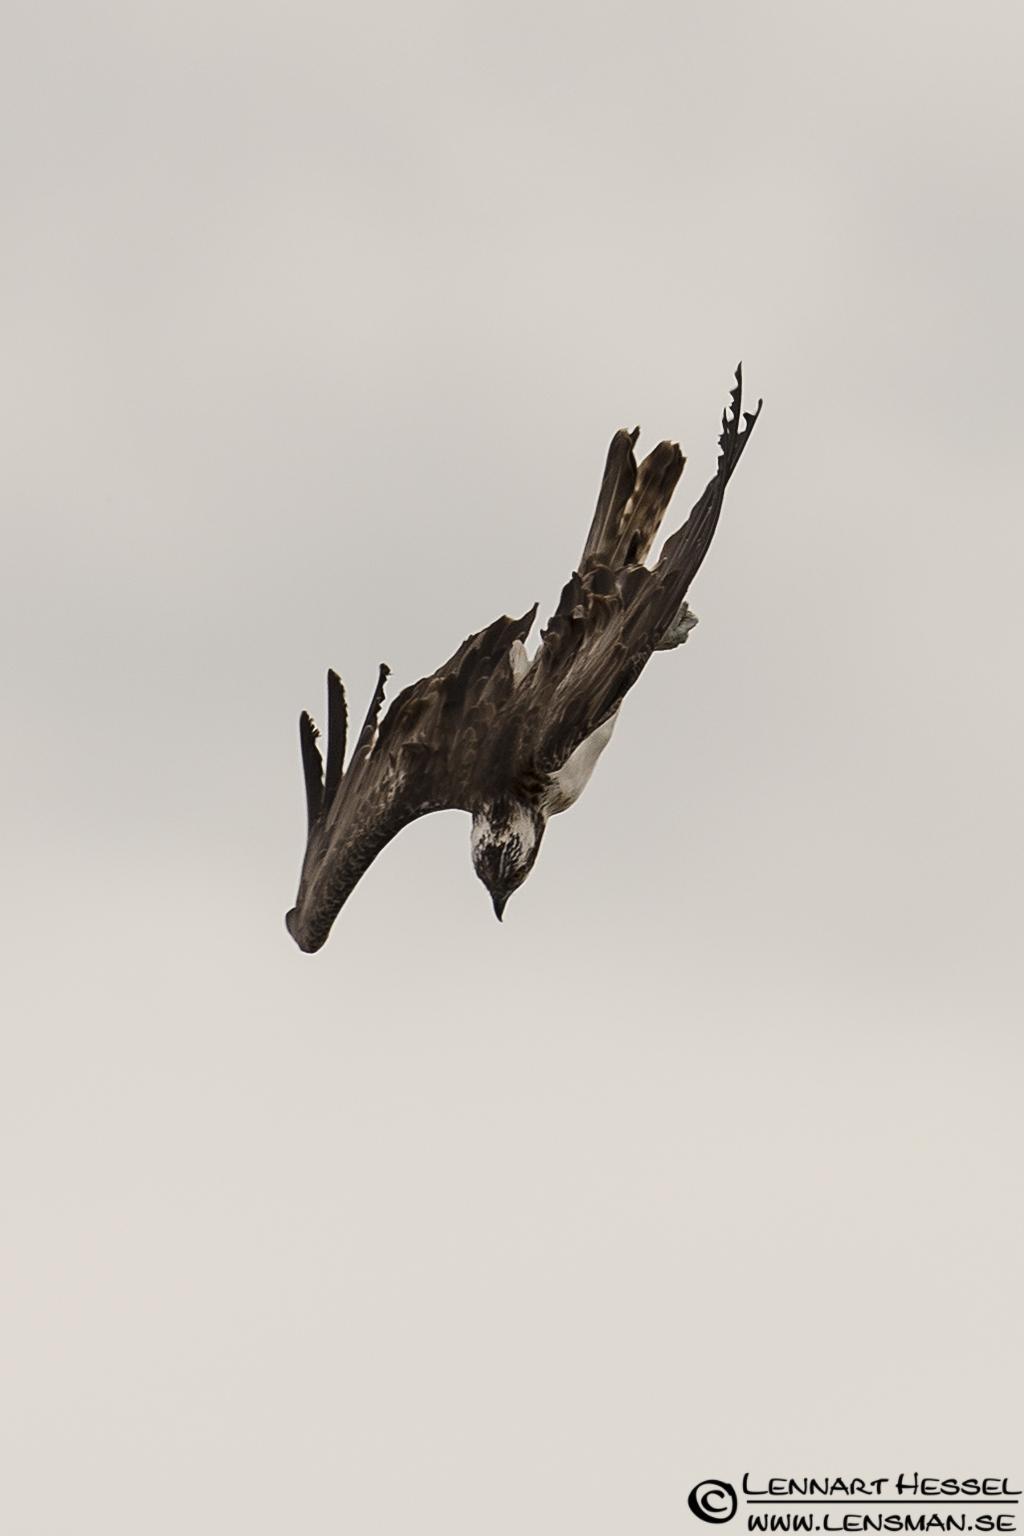 Osprey dive, grasshopper